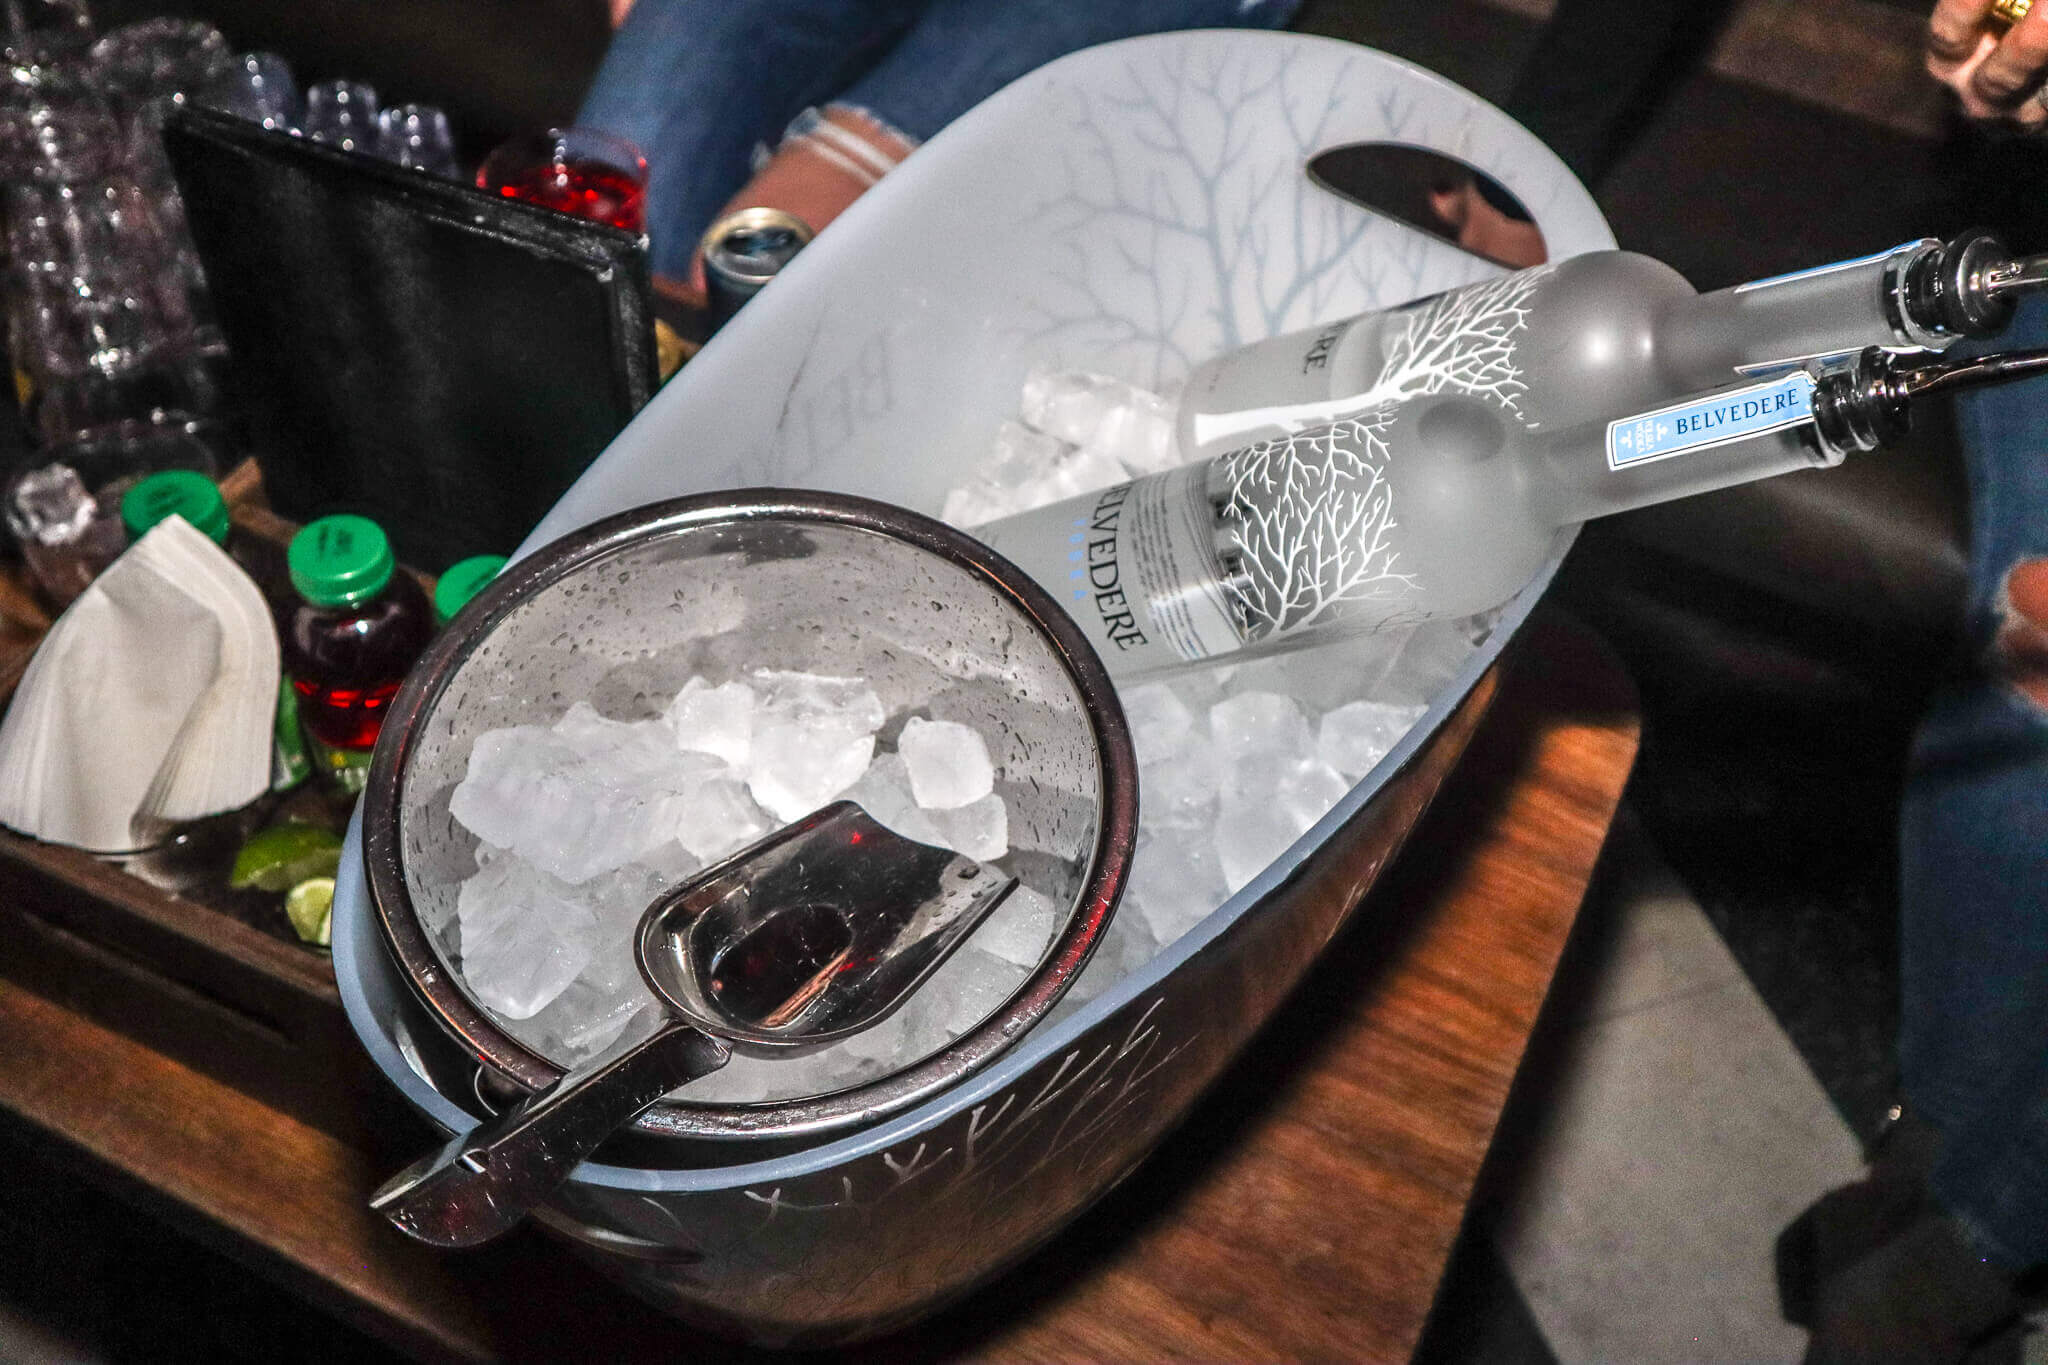 Somwhr Liquor Lounge